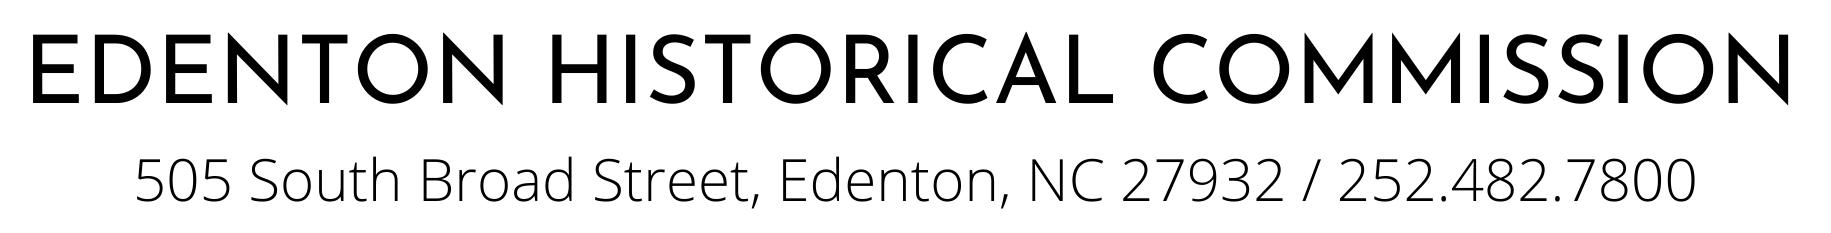 Edenton Historical Commission